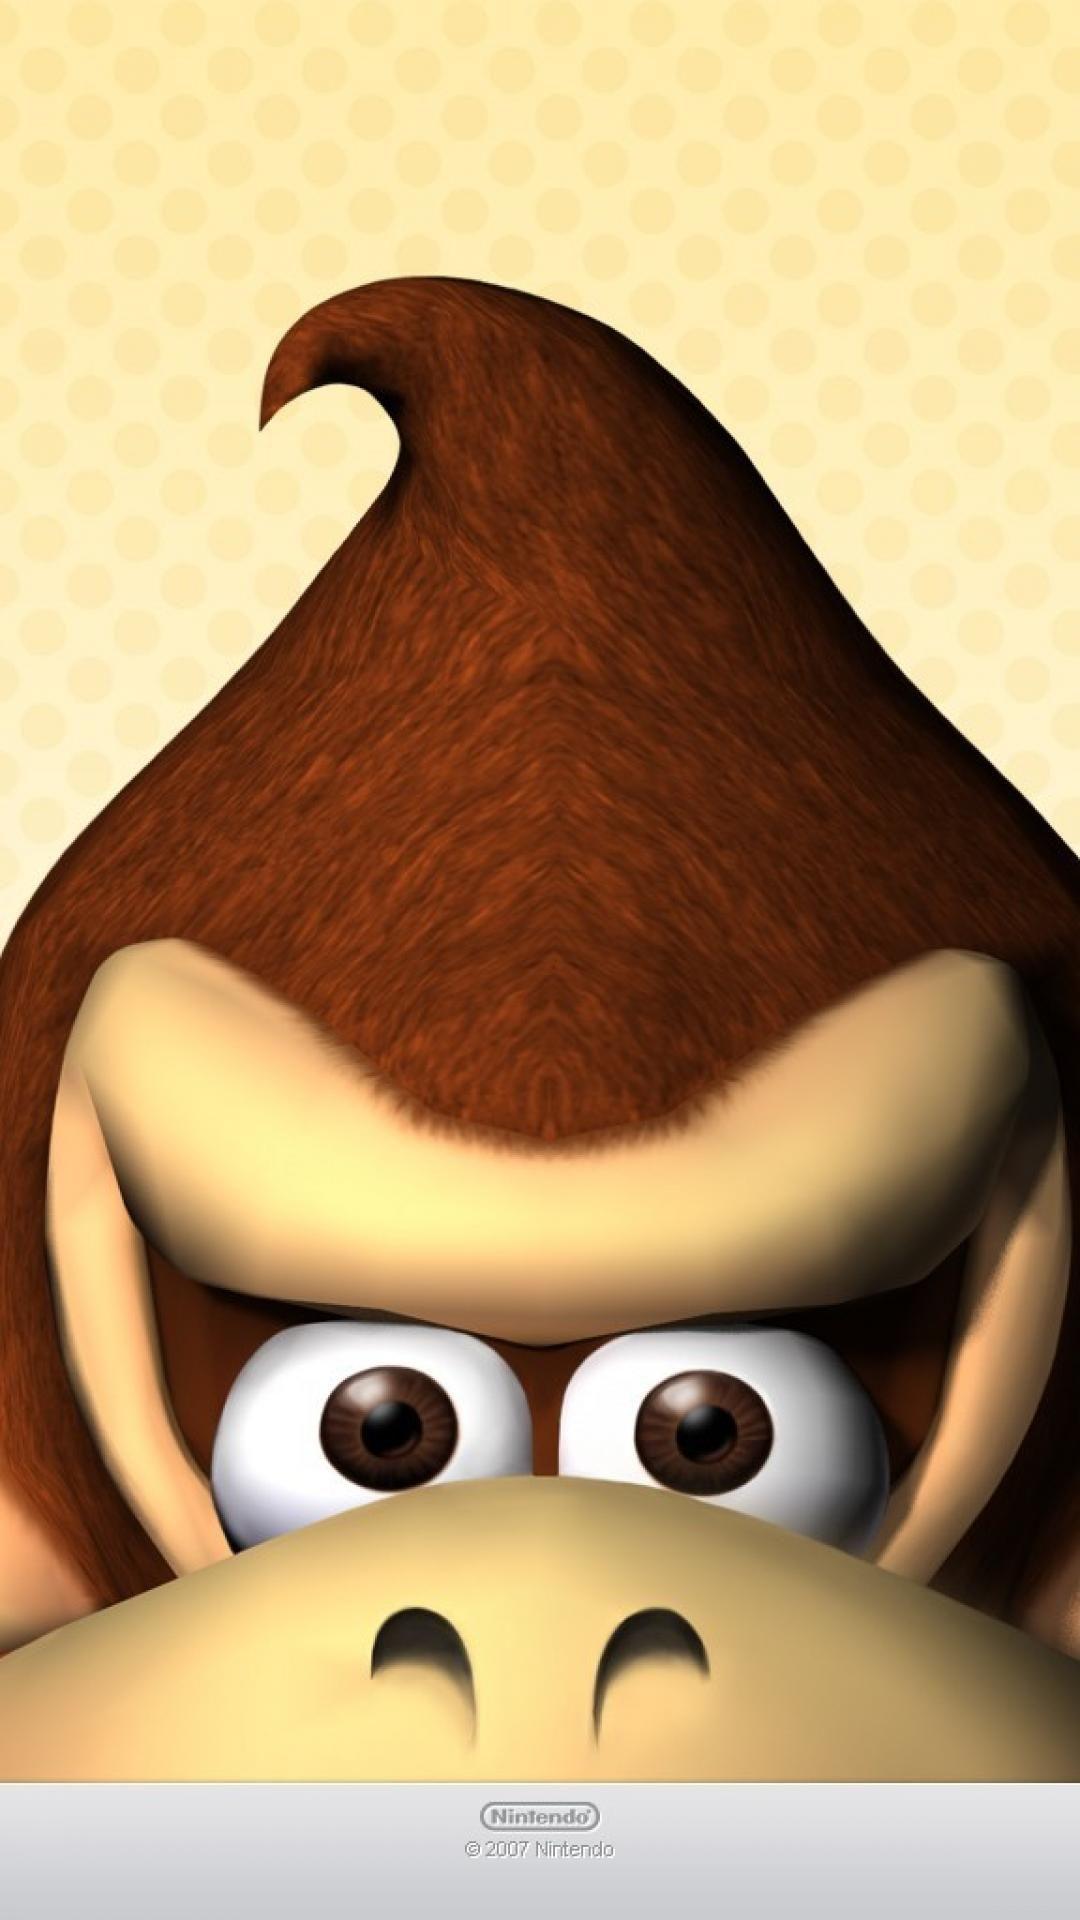 Donkey Kong Iphone Wallpapers On Wallpaperdog